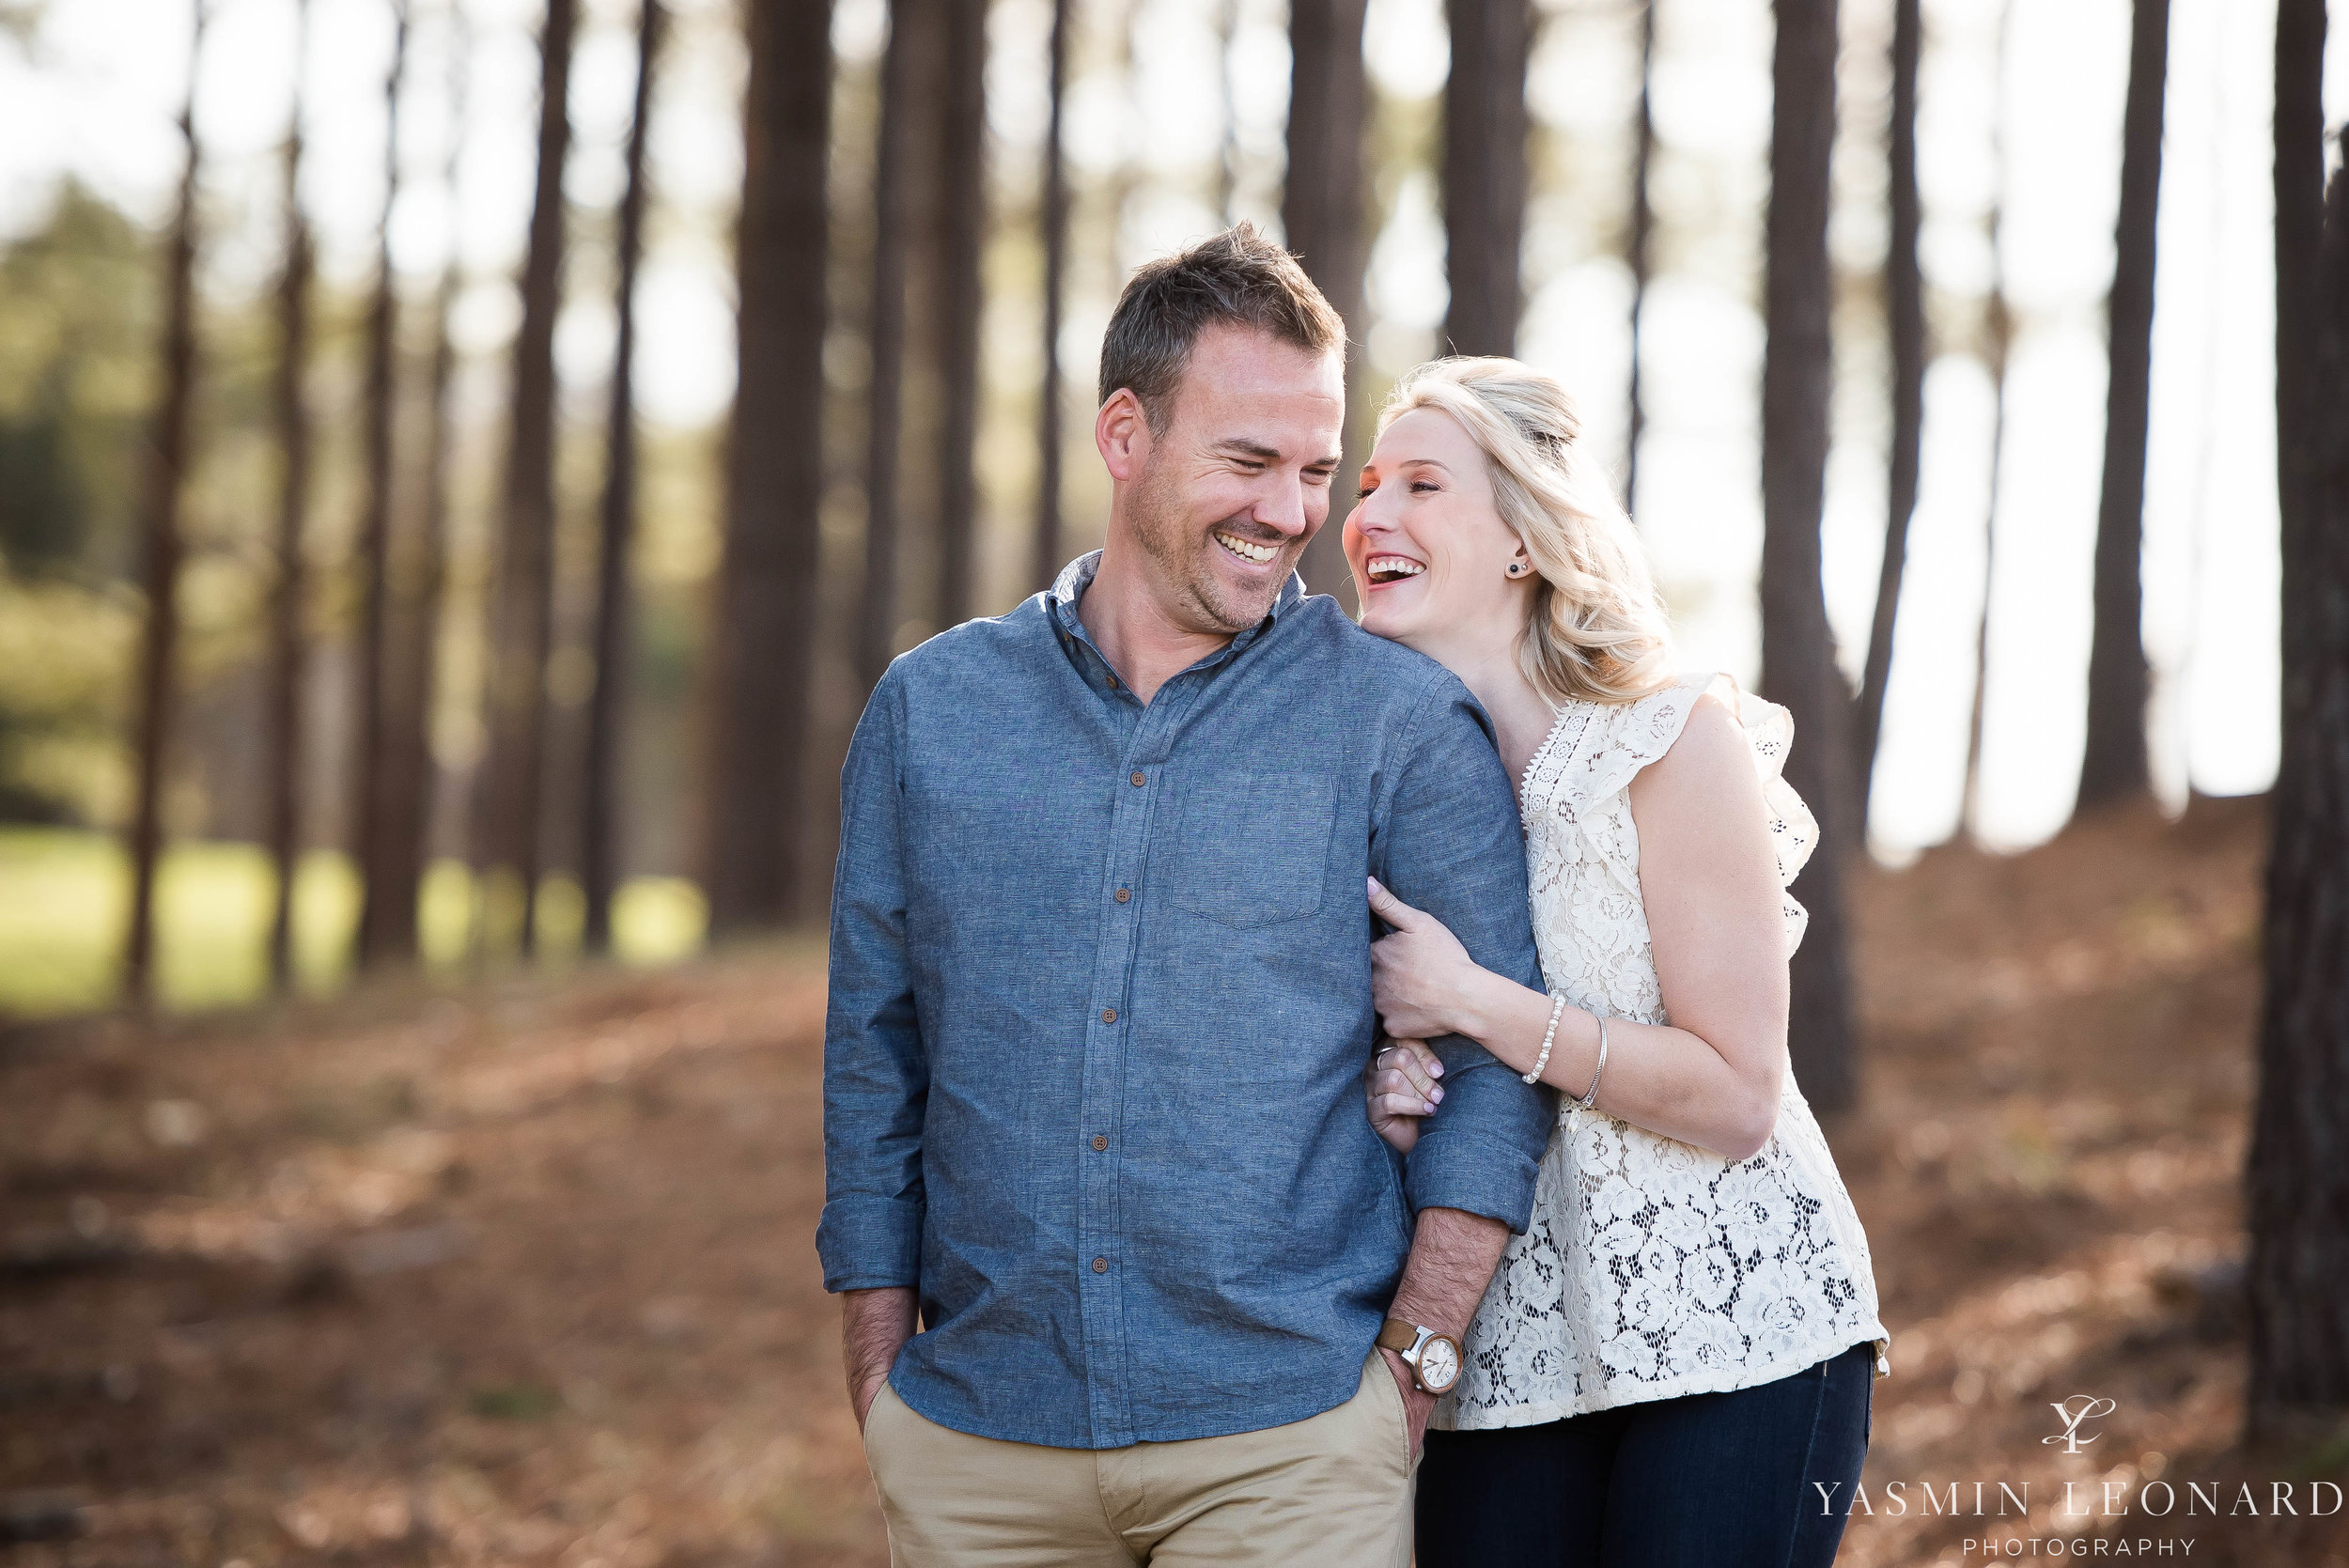 High Point Wedding Photographer - NC Wedding Photographer - Yasmin Leonard Photography - Engagement Poses - Engagement Ideas - Outdoor Engagement Session-3.jpg